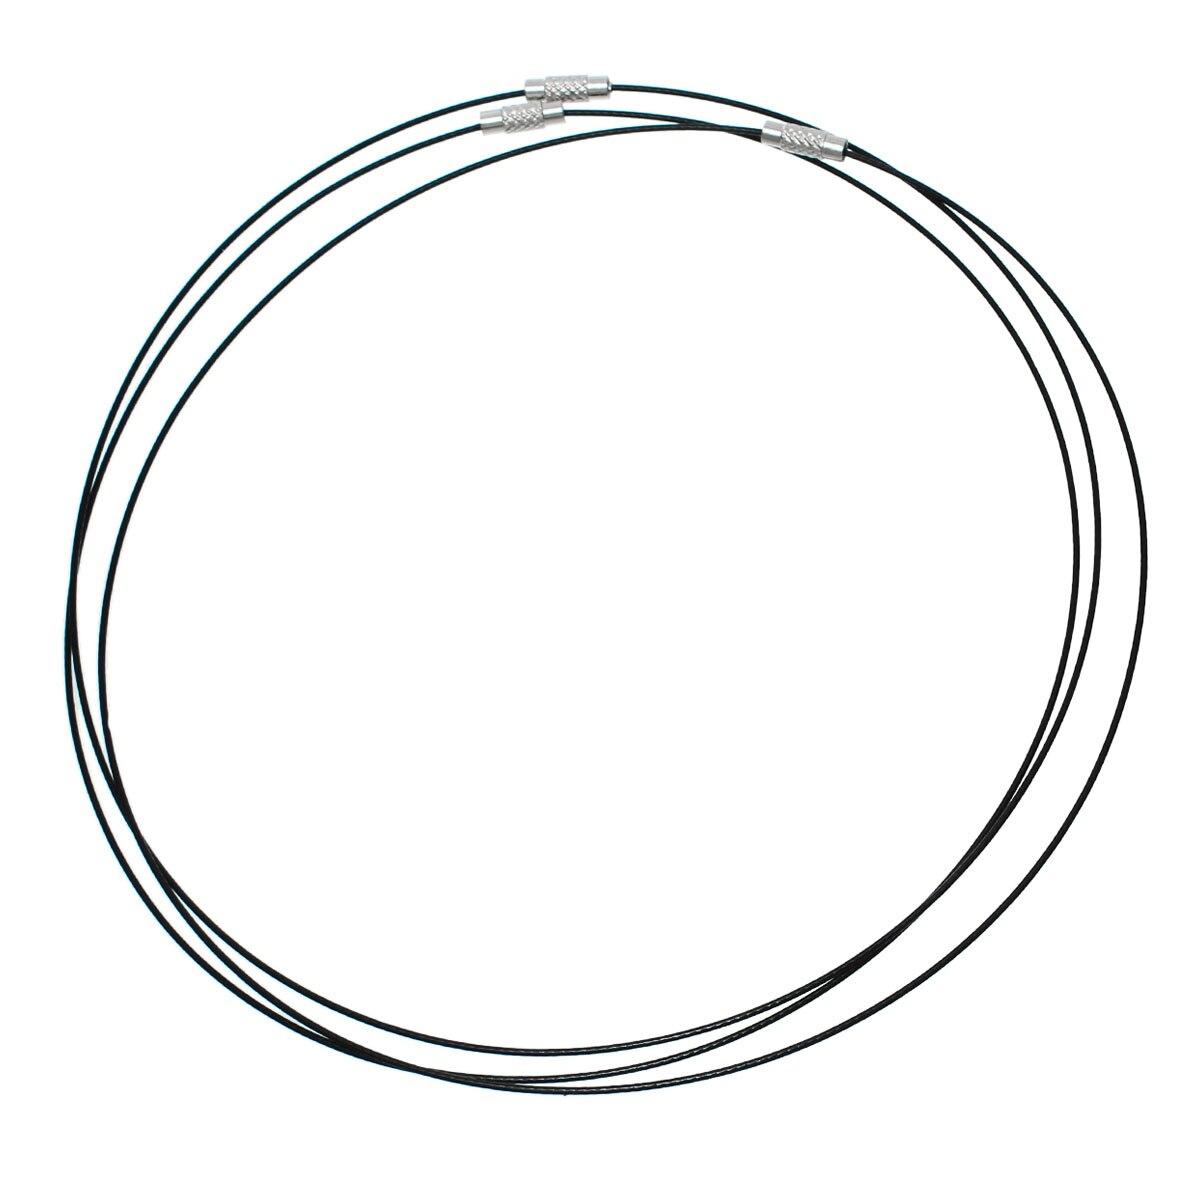 8seasons Steel Wire Choker Necklaces Silver Tone Color